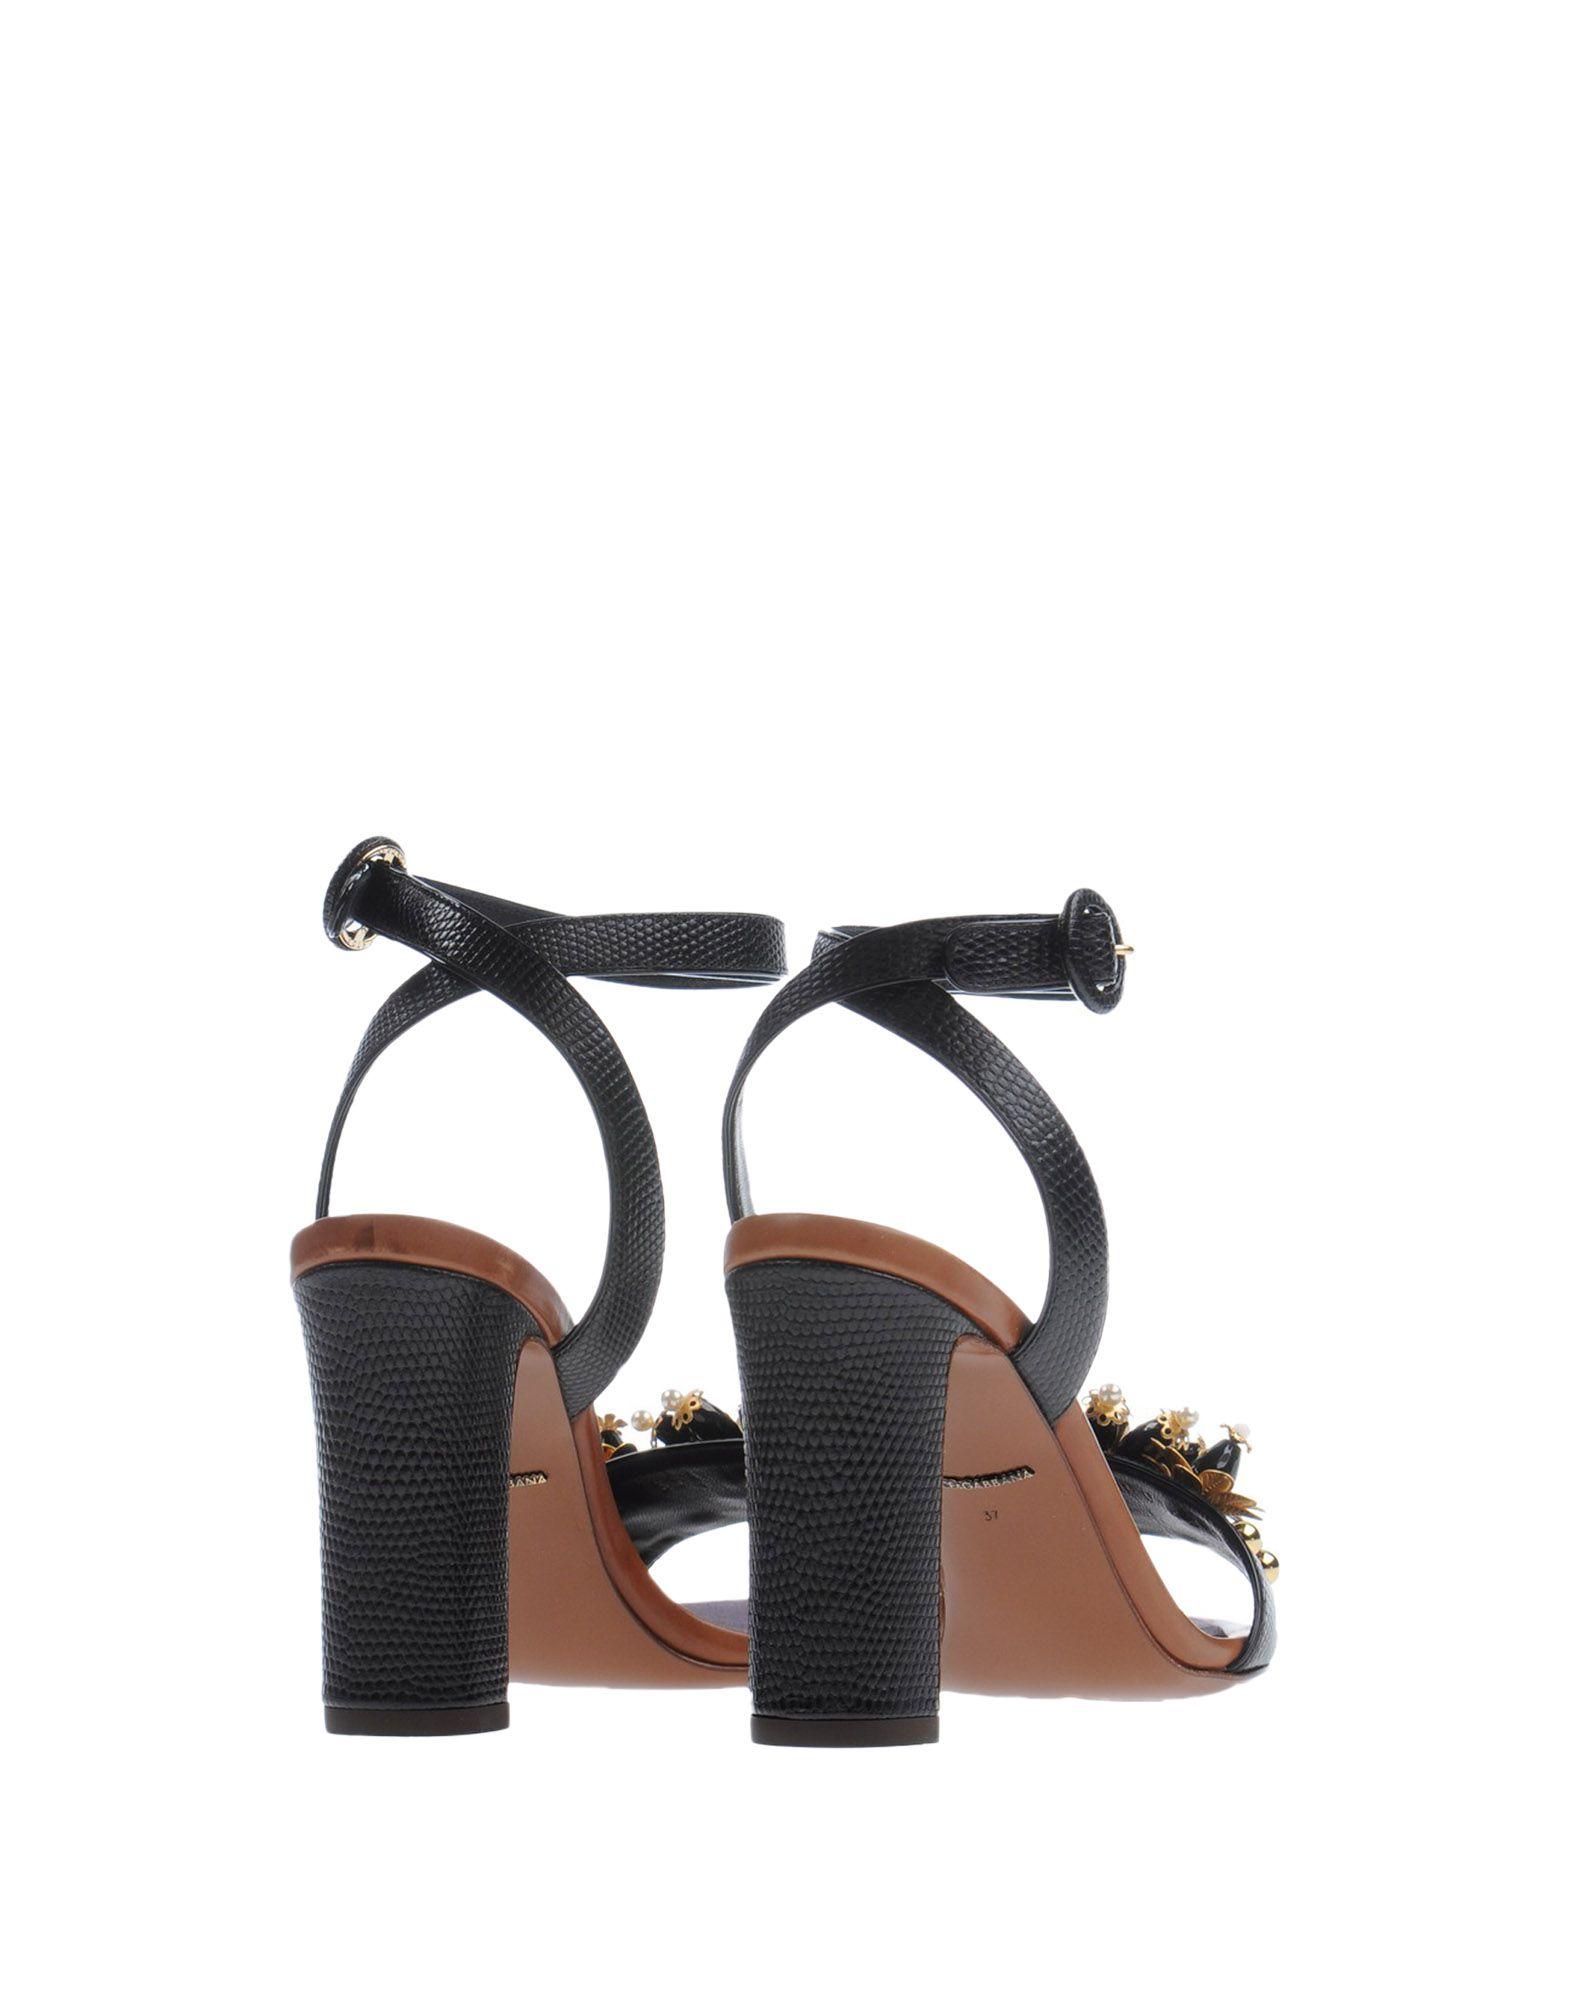 Dolce & Gabbana Sandalen Damen Damen Damen  11132830CX Neue Schuhe f0ff31